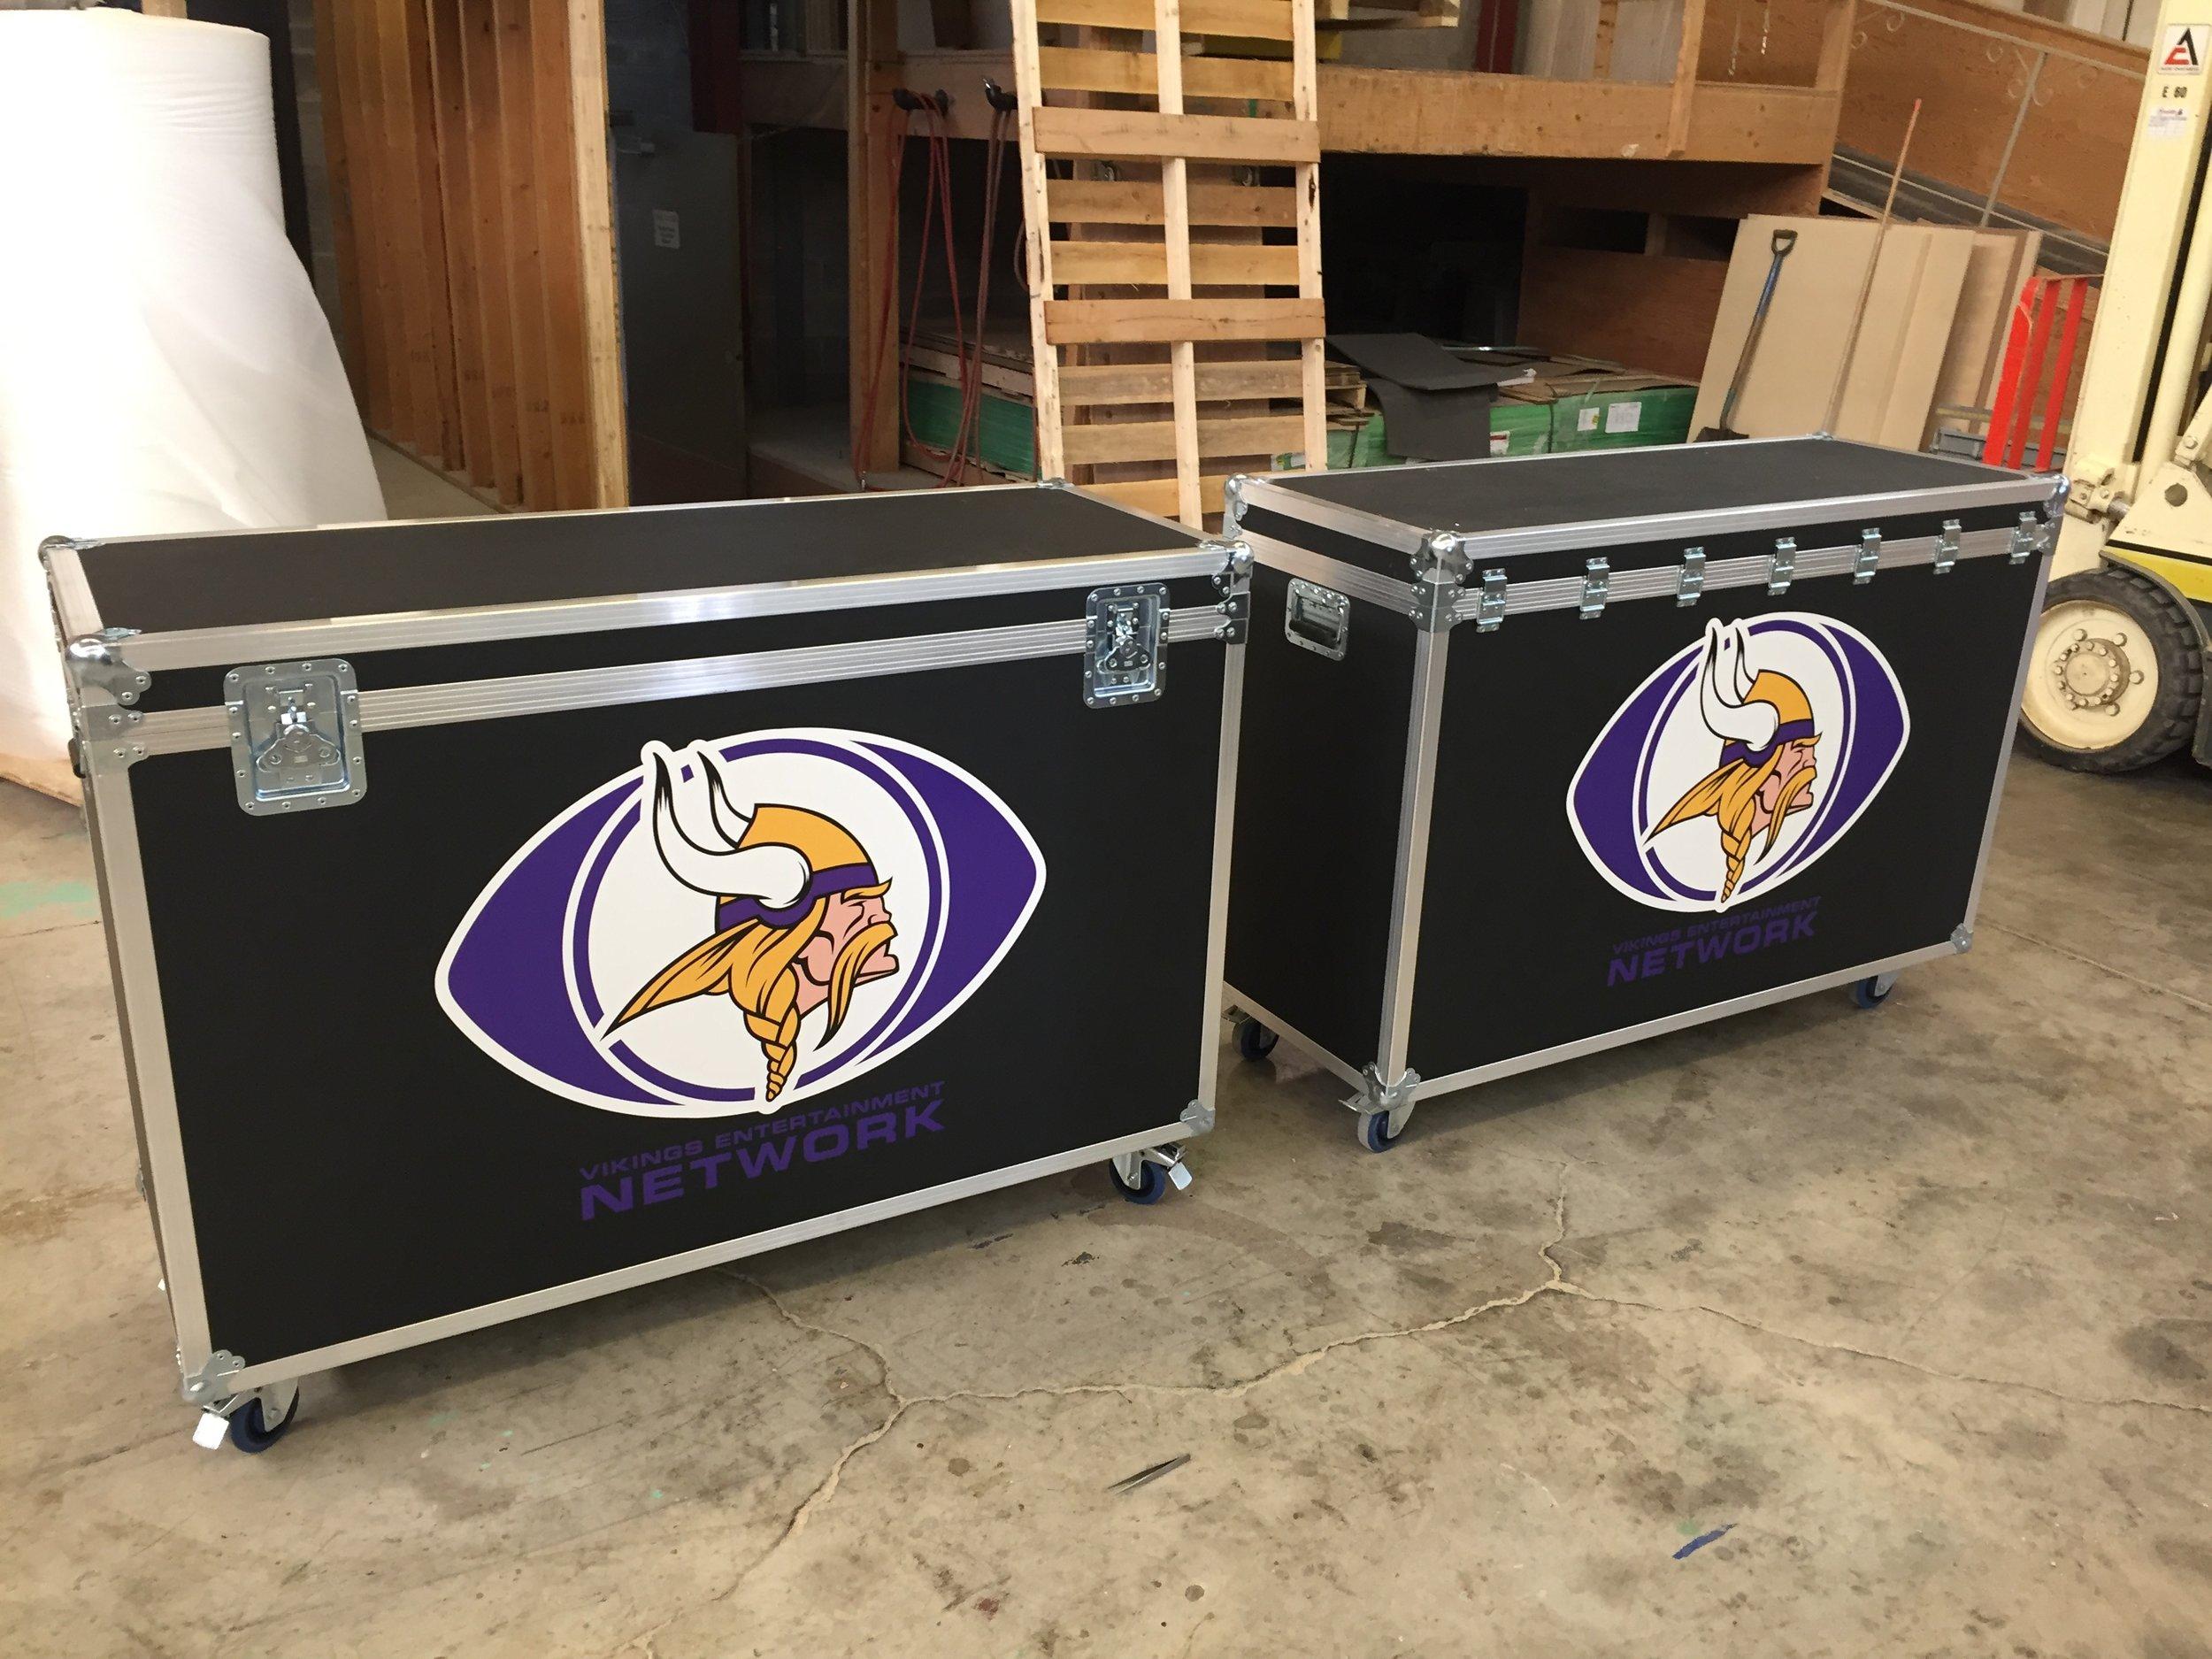 Minnesota Vikings Graphics